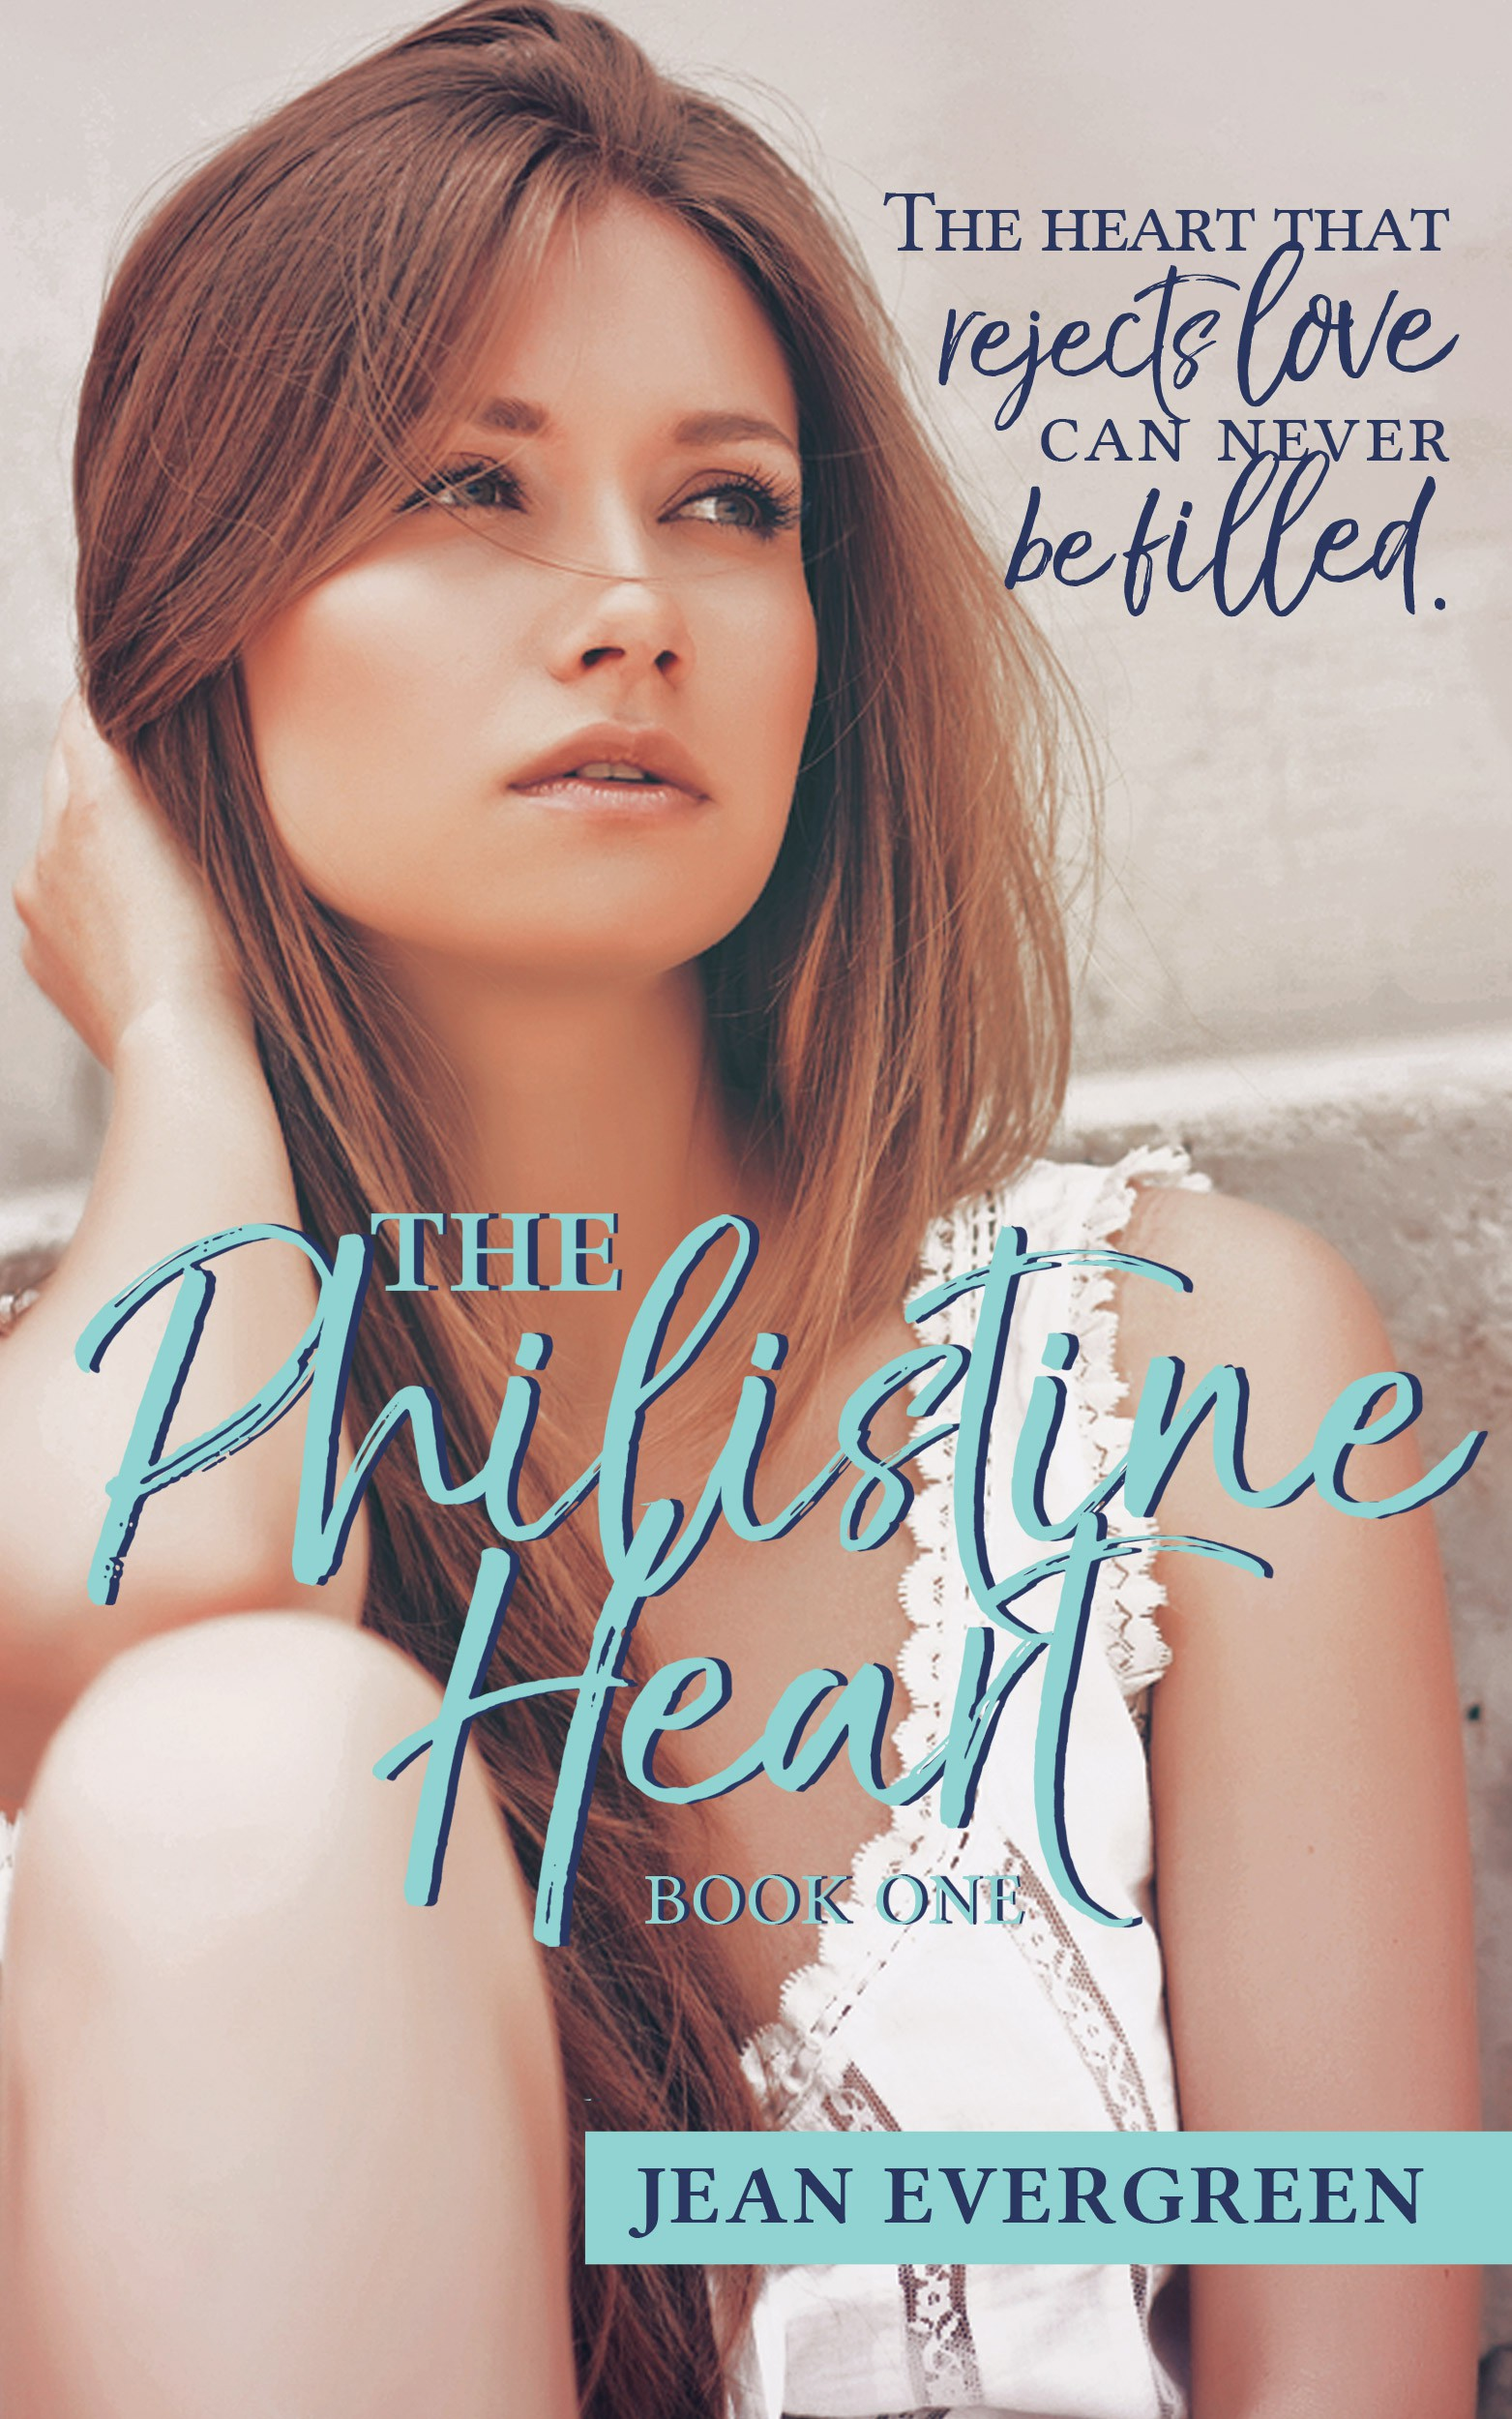 The Philistine Heart